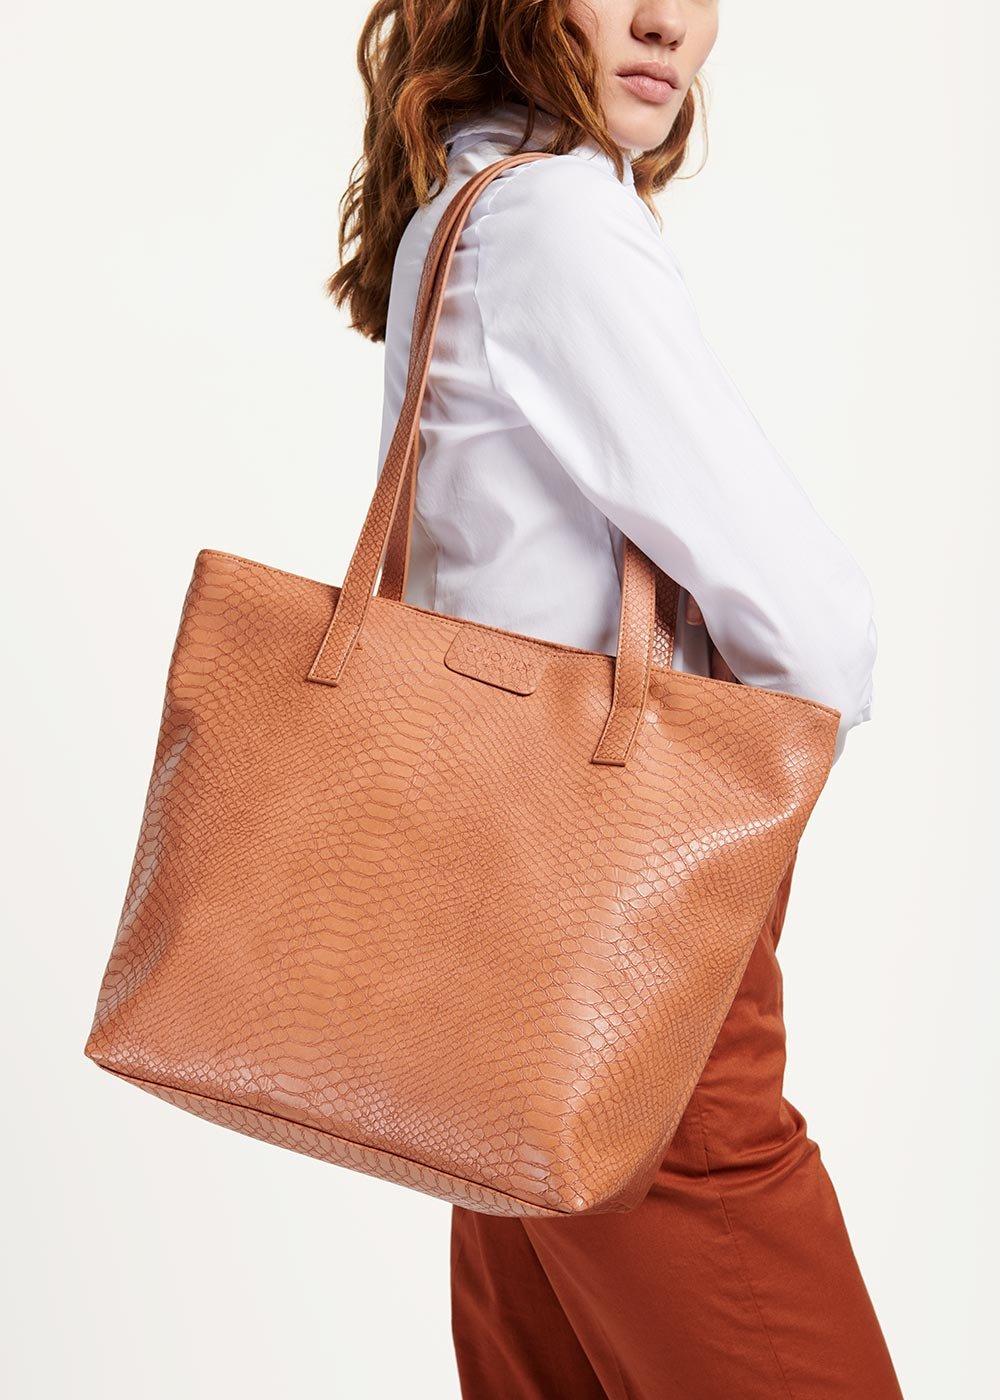 Badia shopping bag - Sughero - Woman